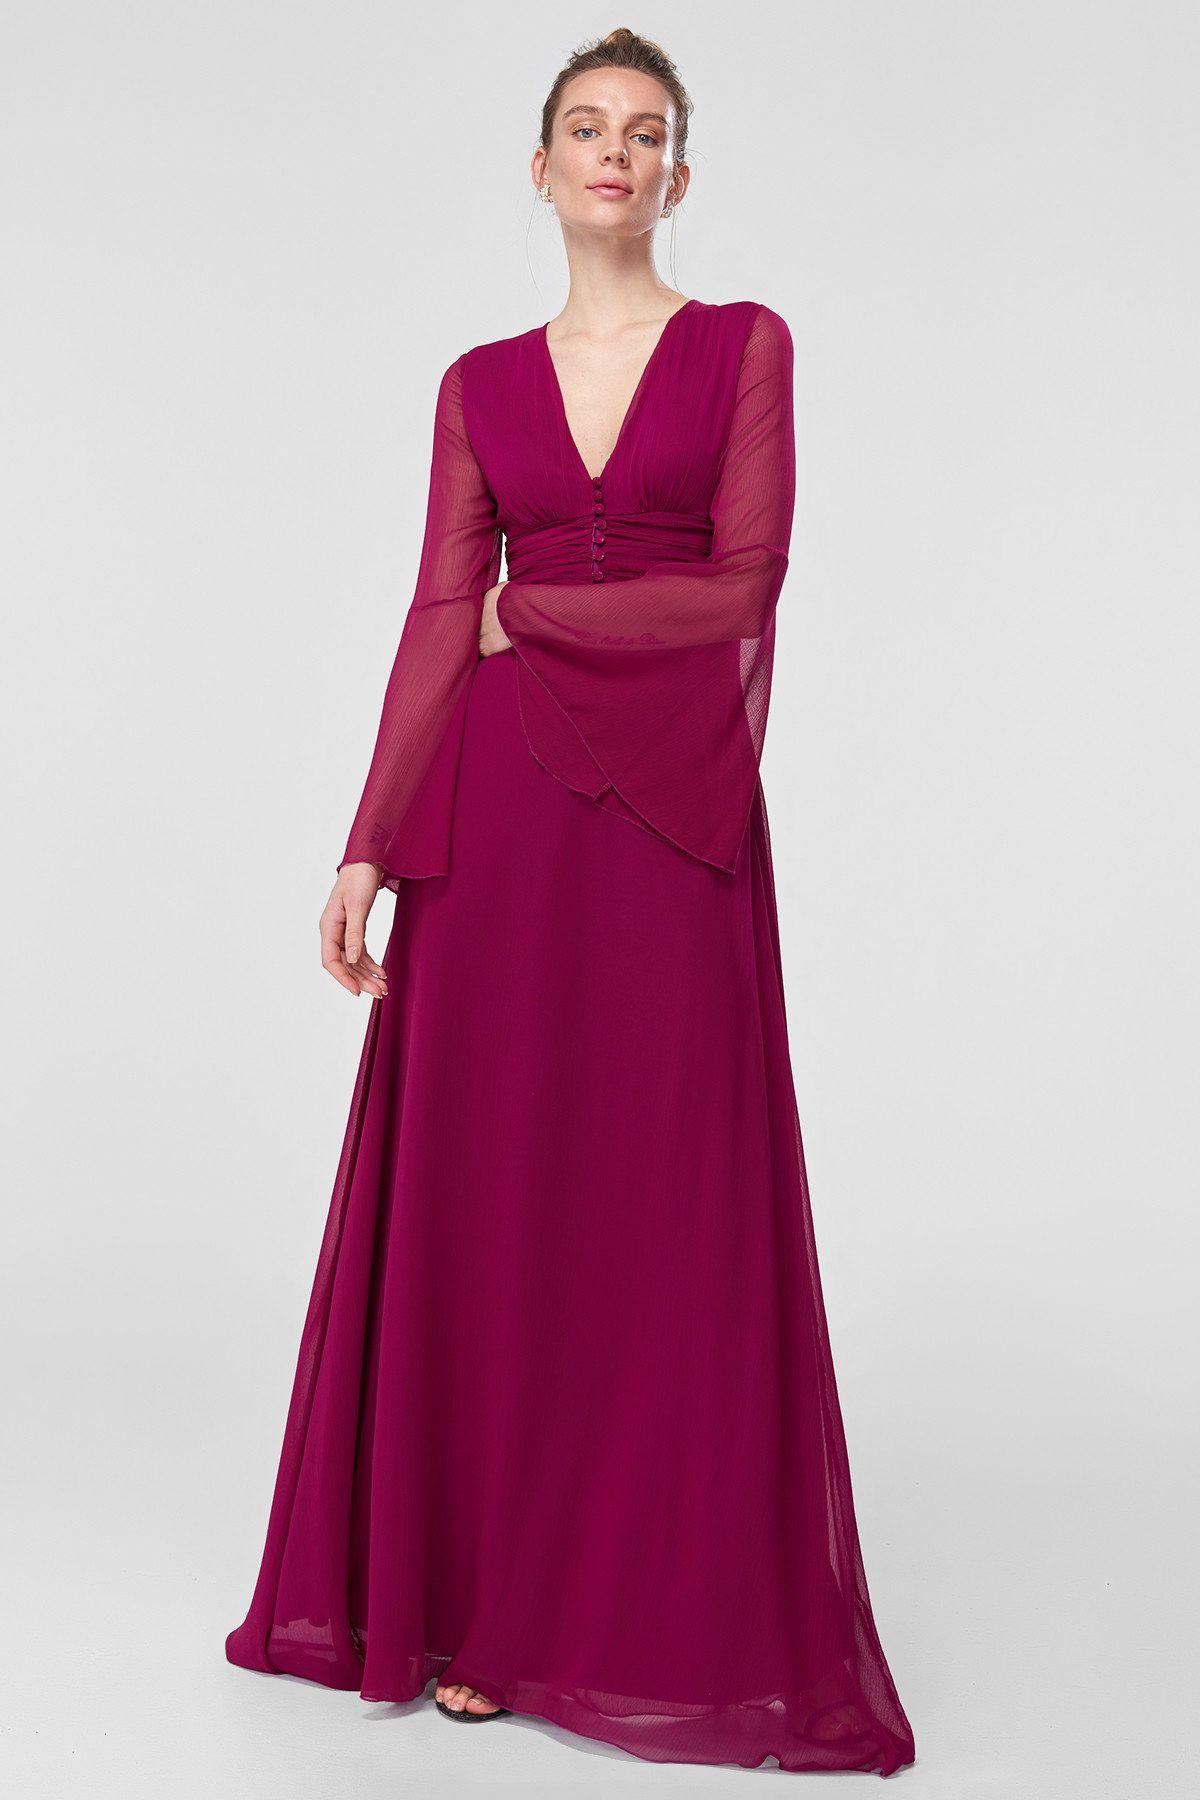 Mor Dugme Detayli Abiye Elbise Tprss18fz0141 Trendyolmilla Trendyol Elbise Modelleri Elbise The Dress